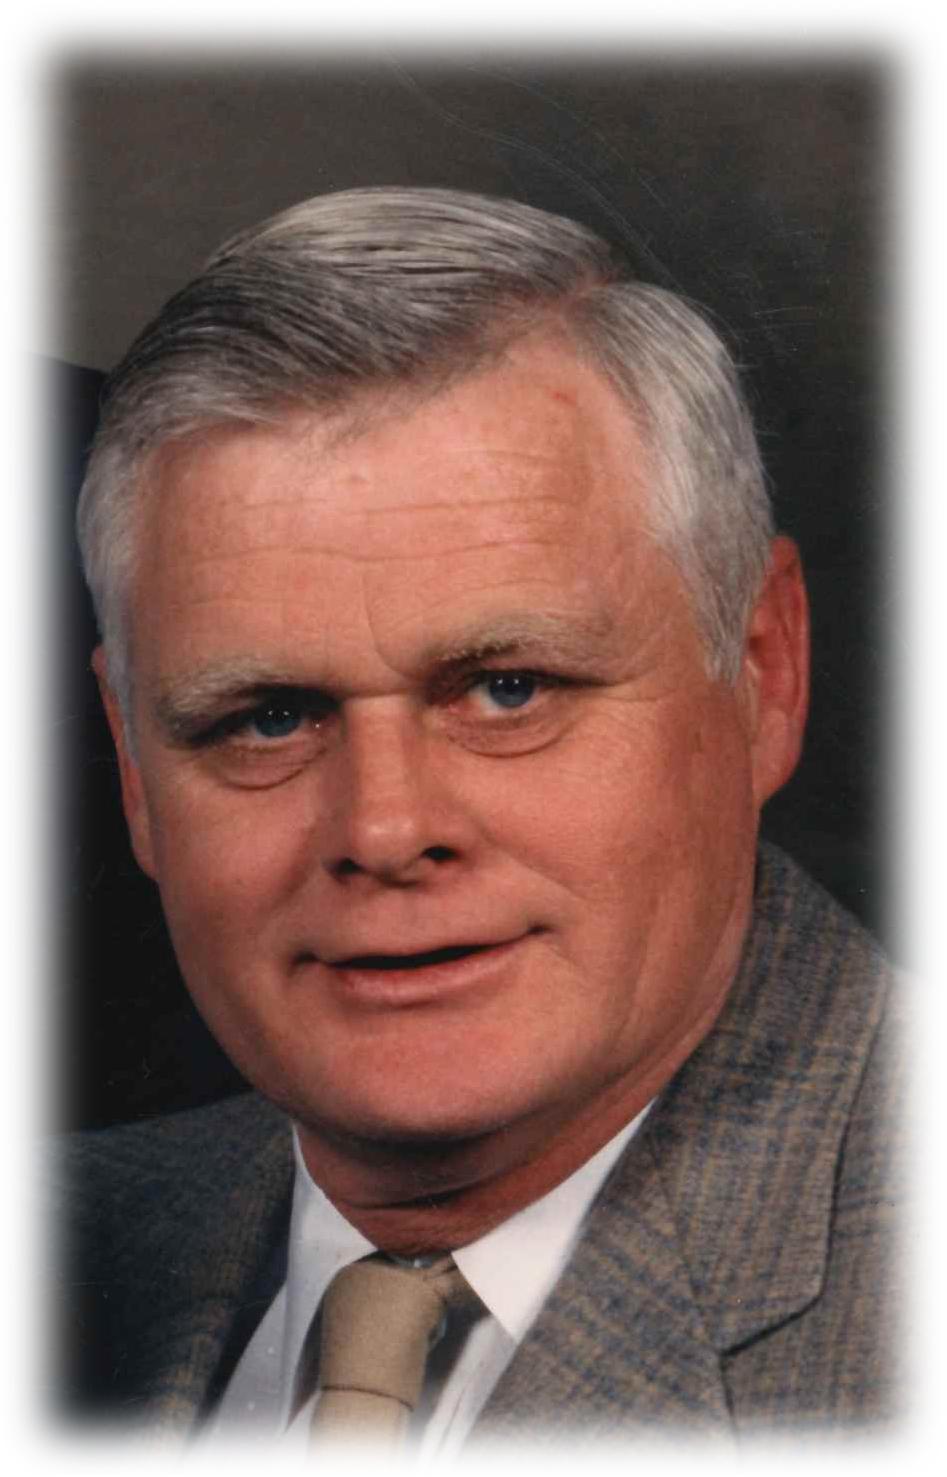 Gary G. Michael